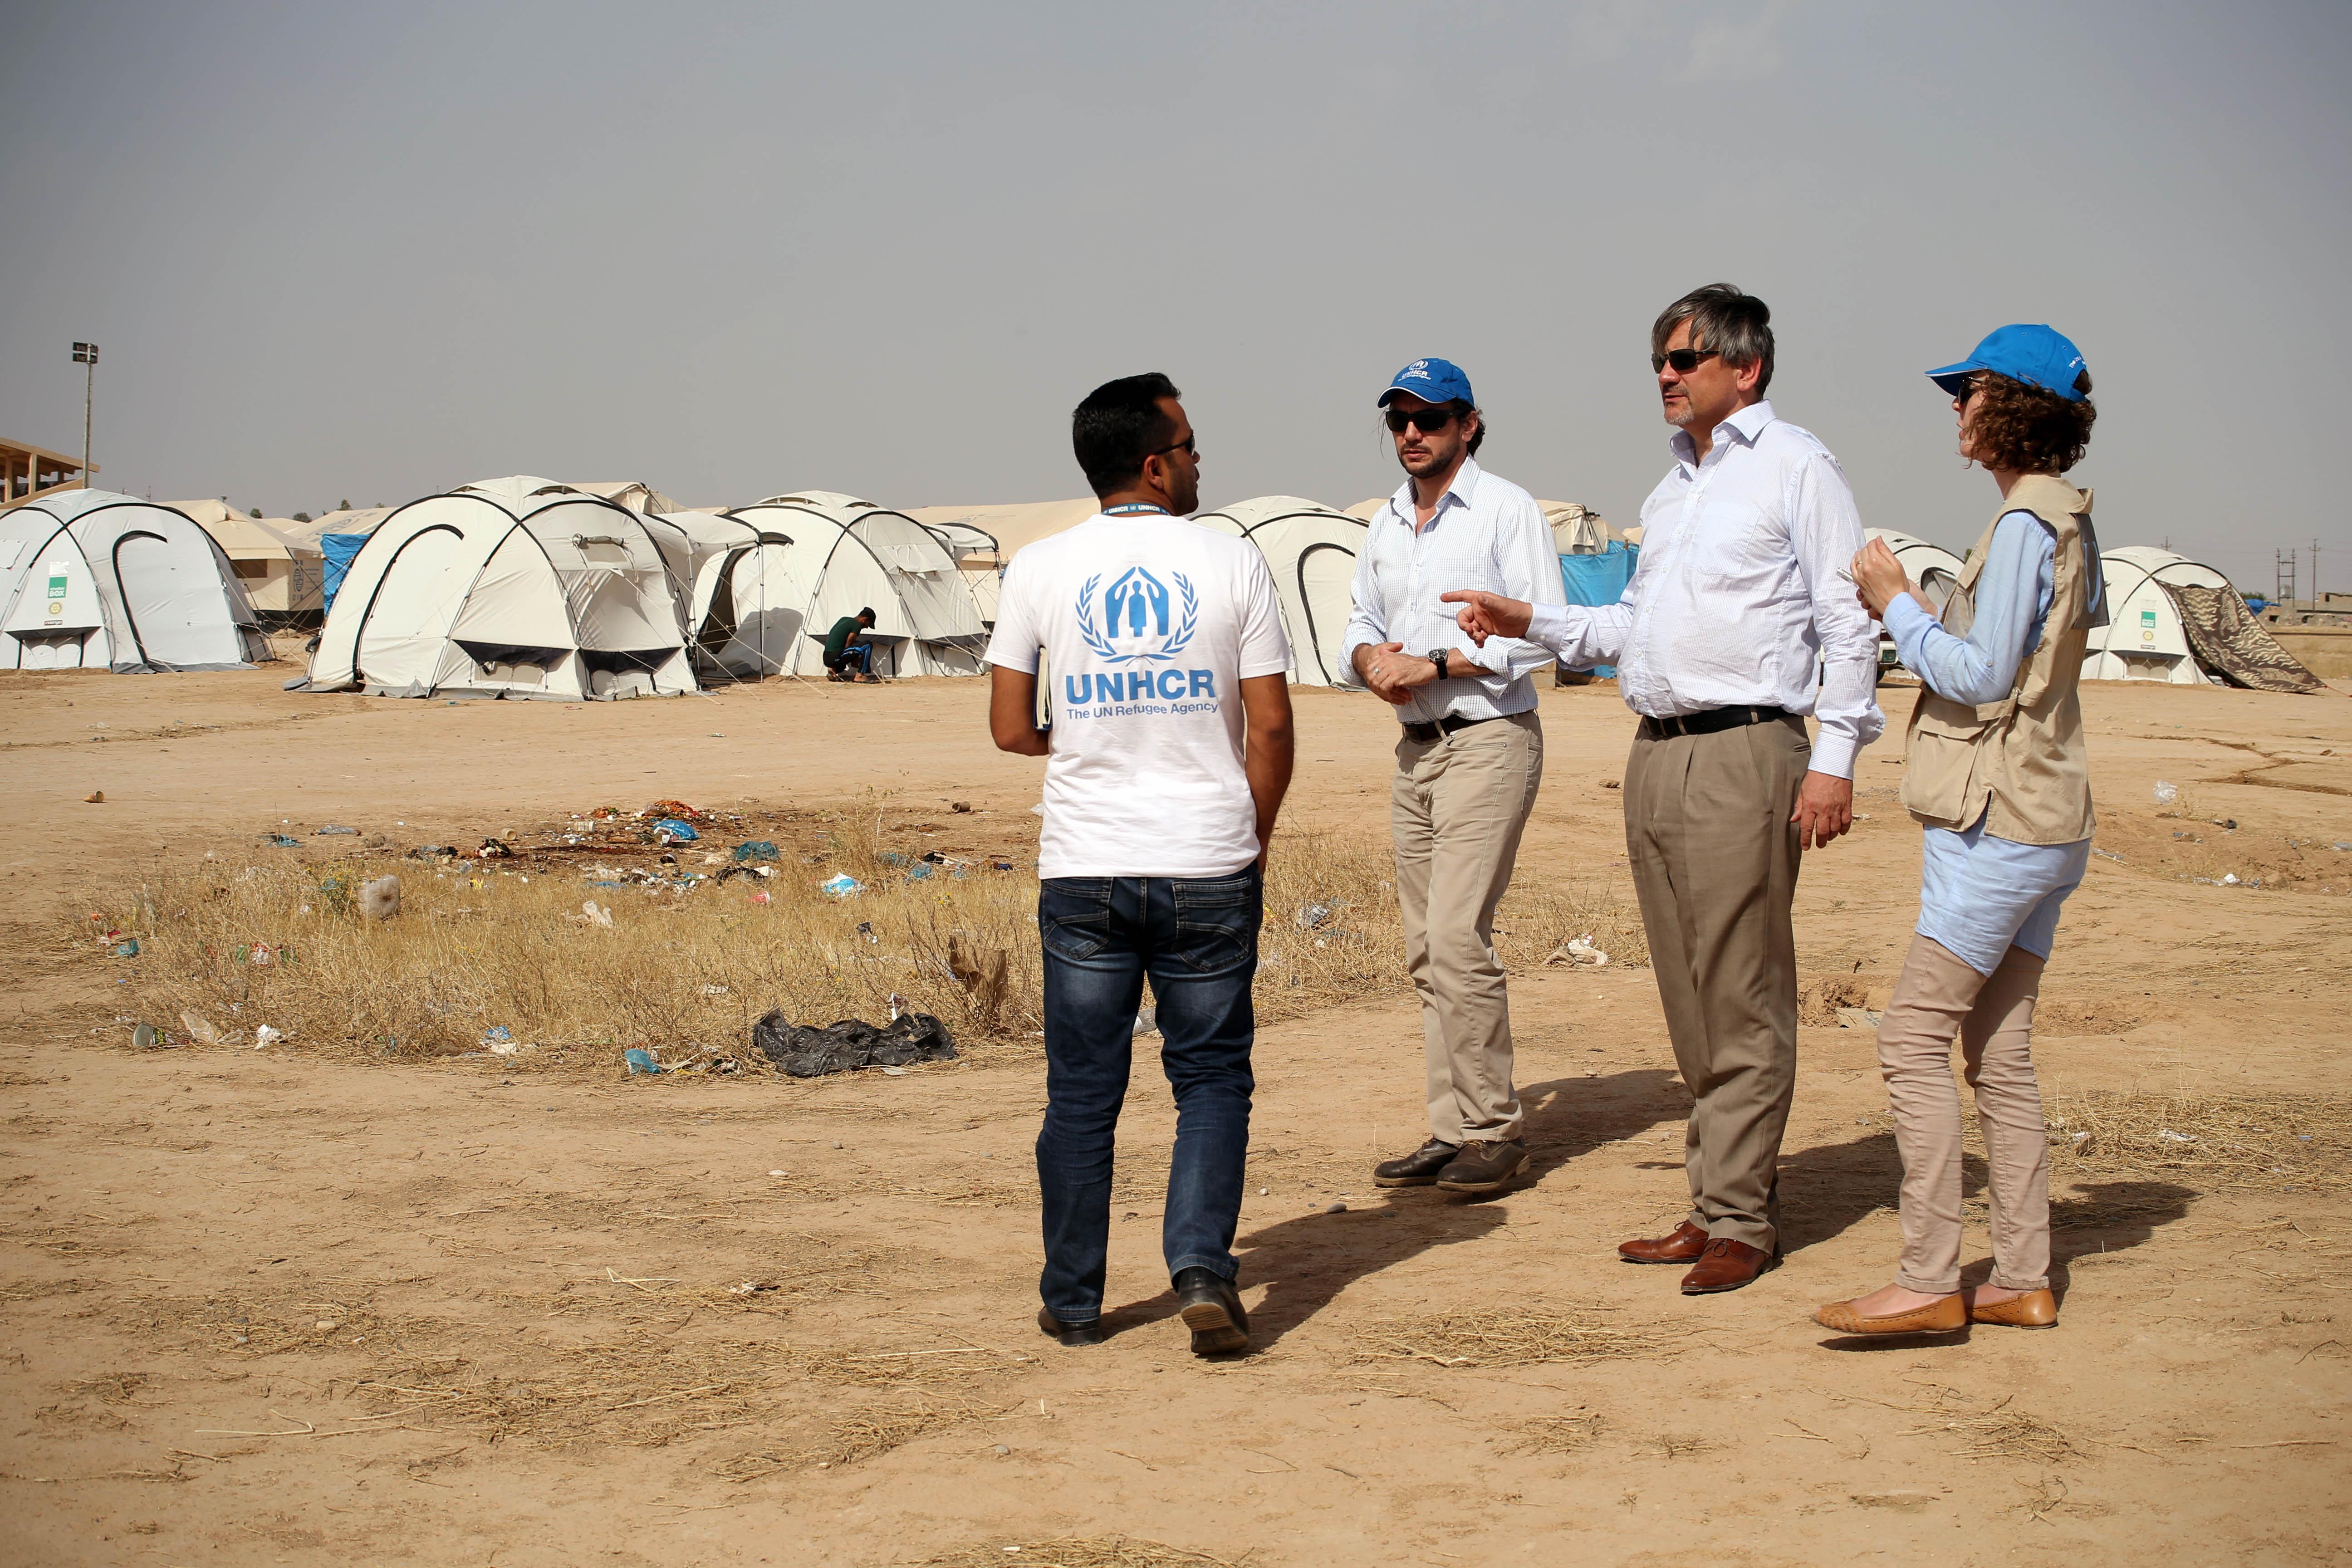 The Special Representative of the Secretary-General for Iraq